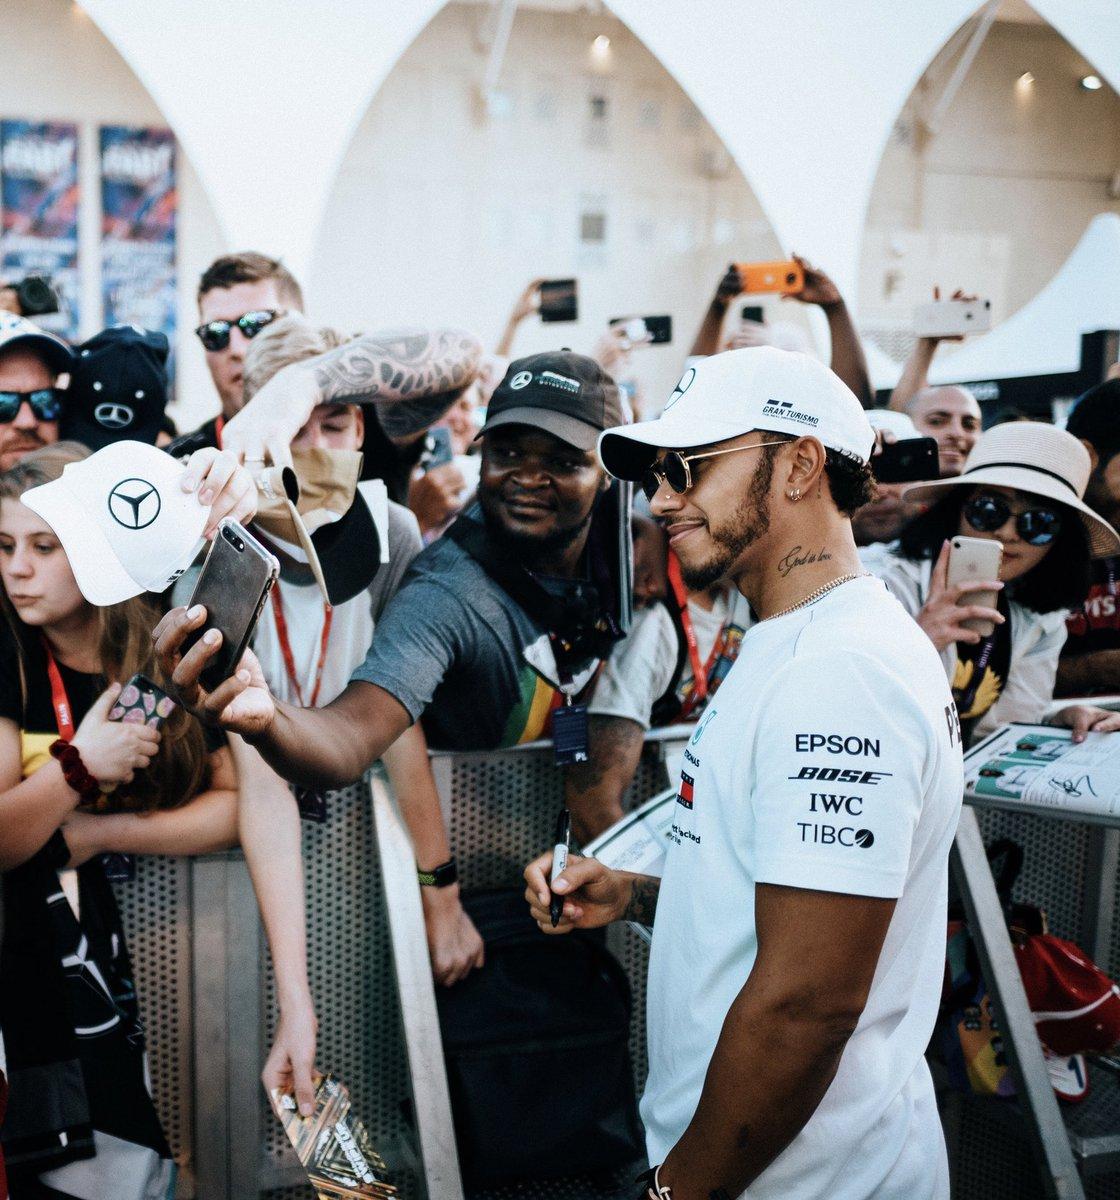 Arrival, Abu Dhabi ☀️🙌🏾 #F1 #TeamLH